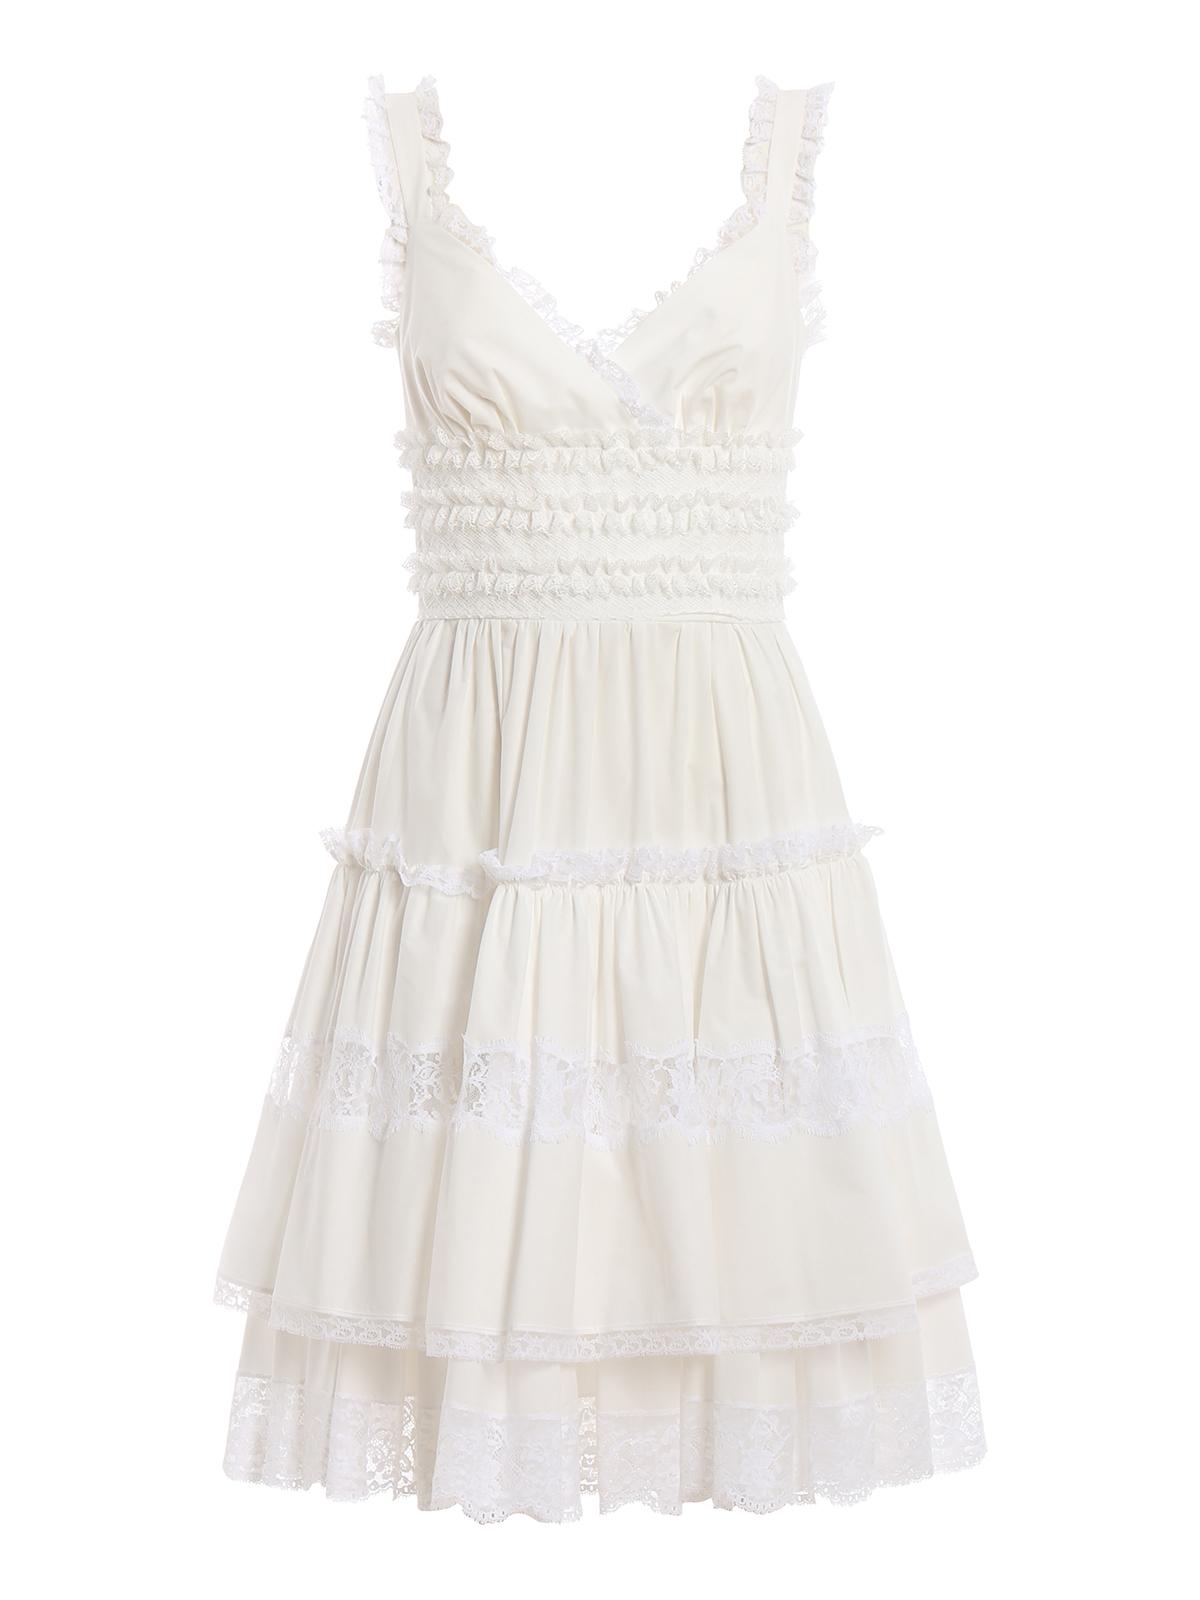 091393ce1b5ff DOLCE & GABBANA: knee length dresses - Lace embellished white poplin slip  dress